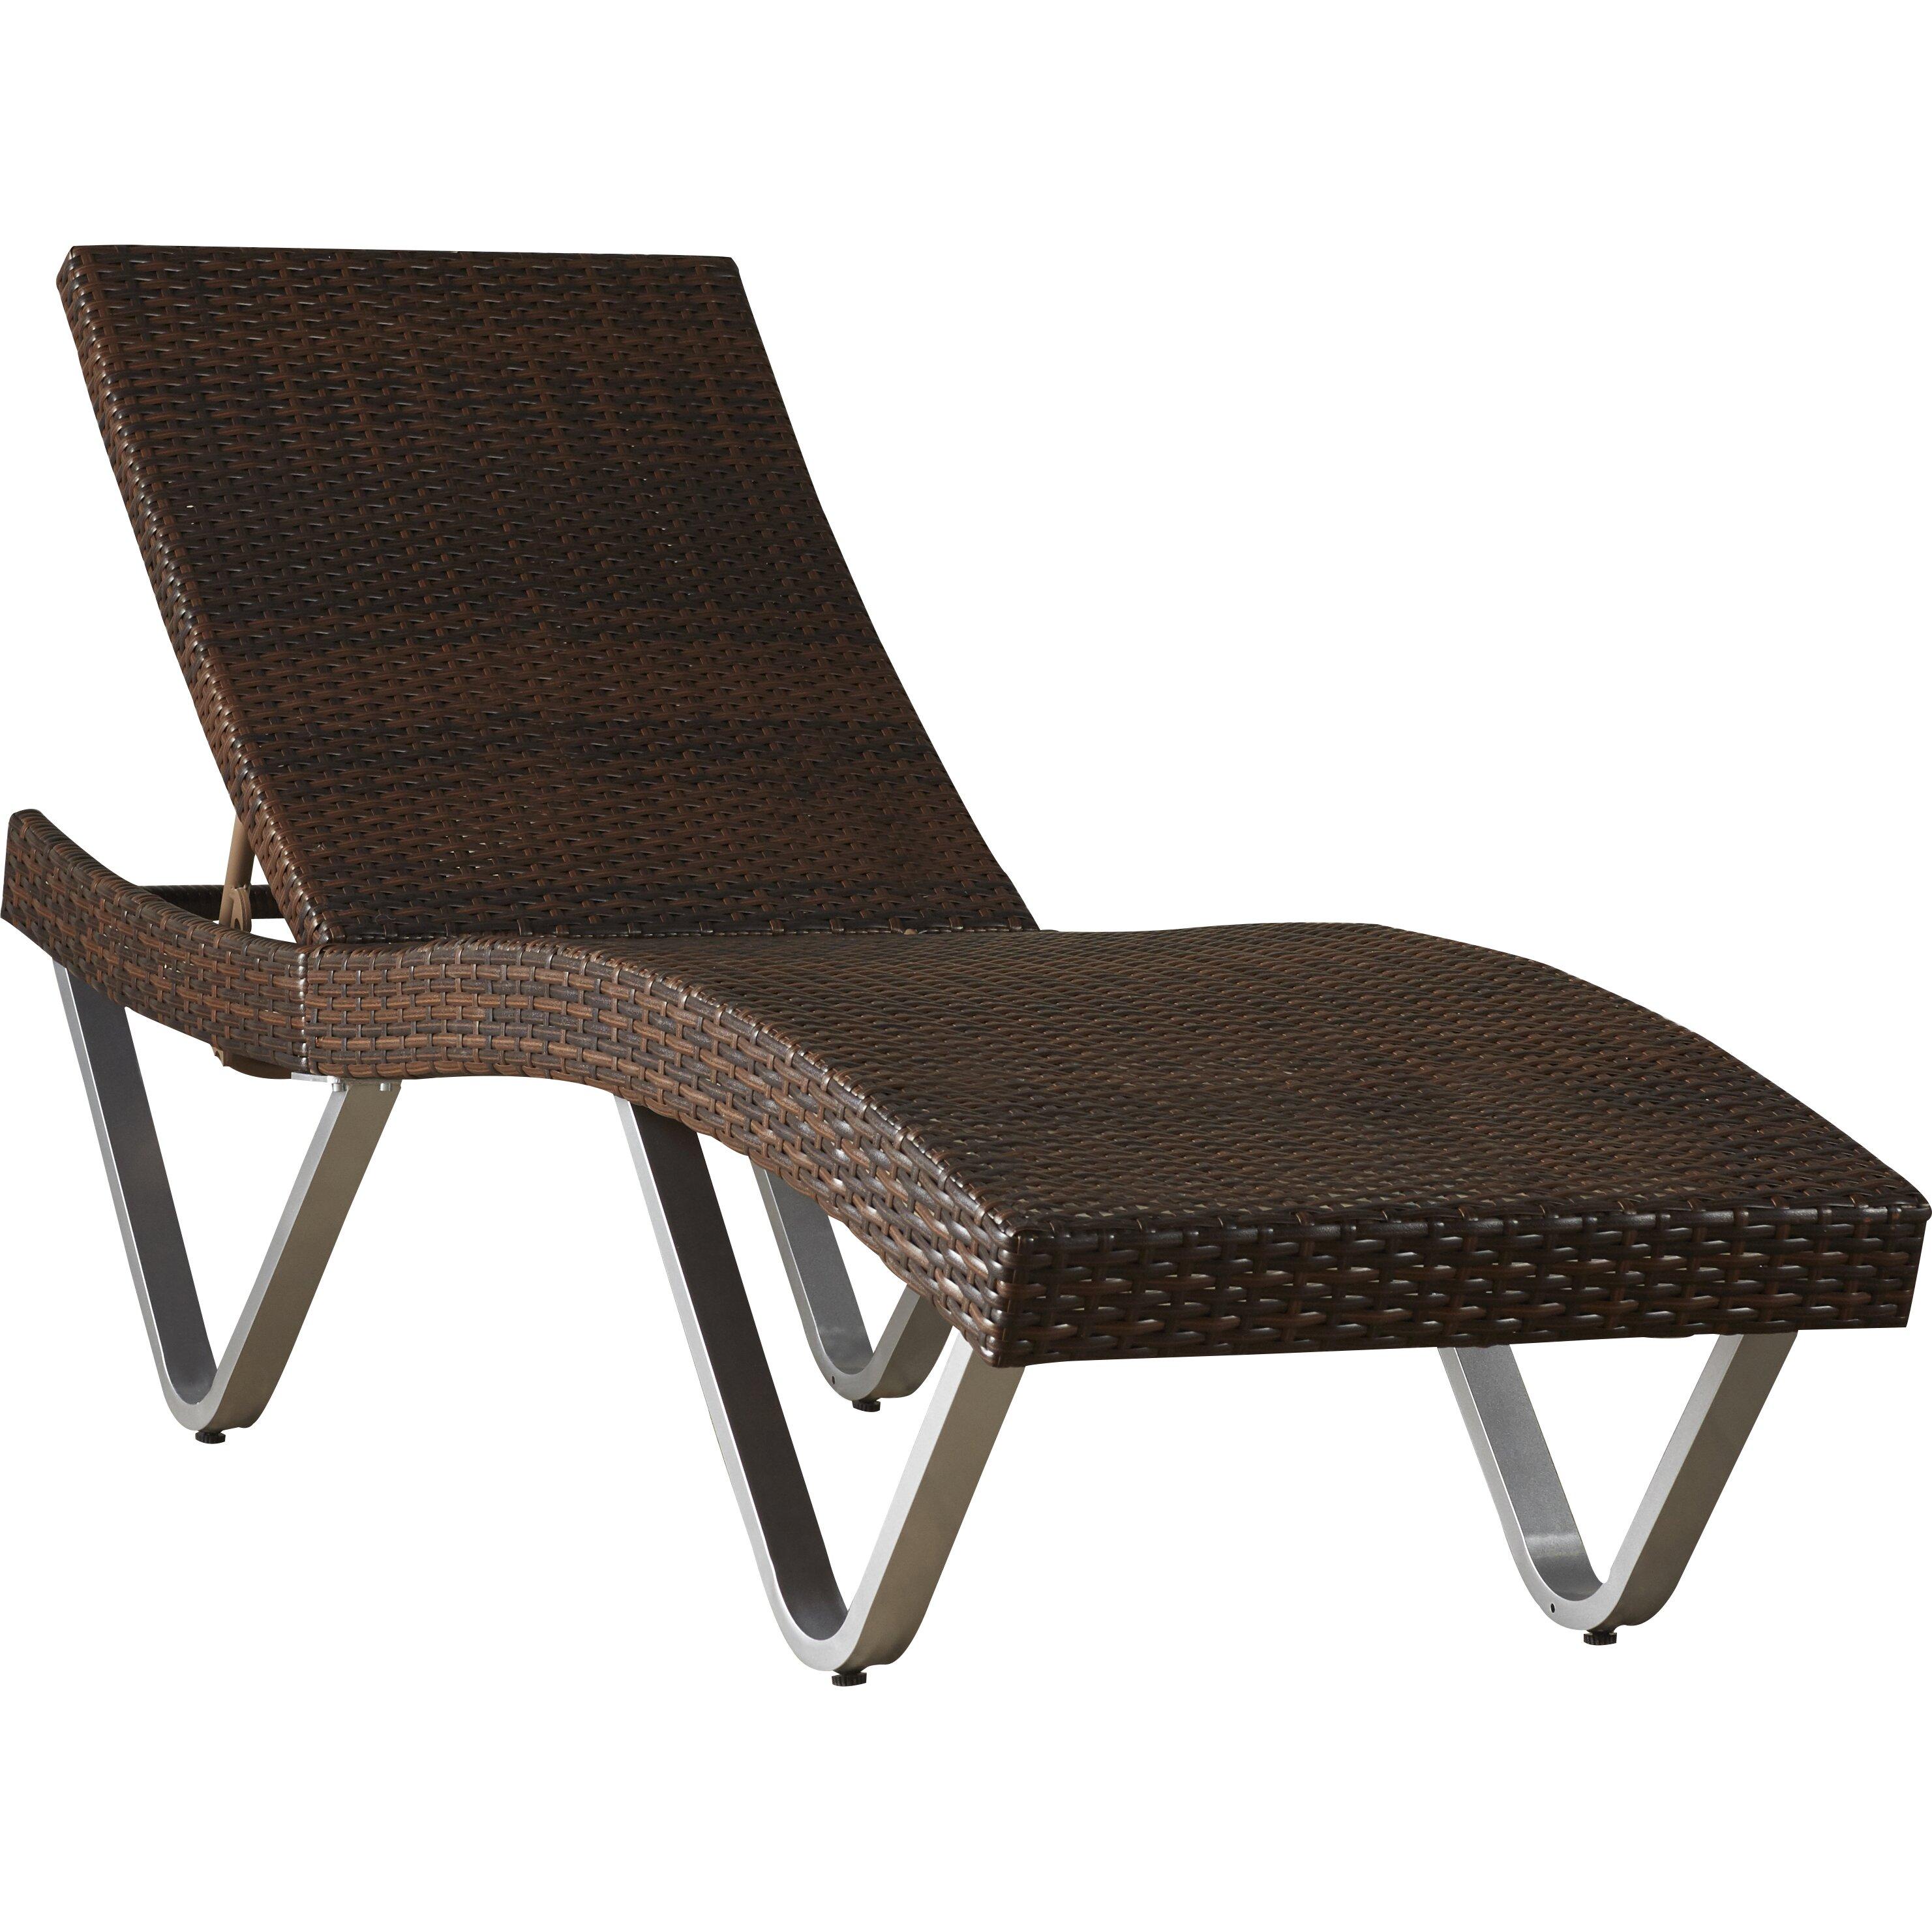 Mercury row chaise lounge reviews wayfair for Ashley san marco chaise